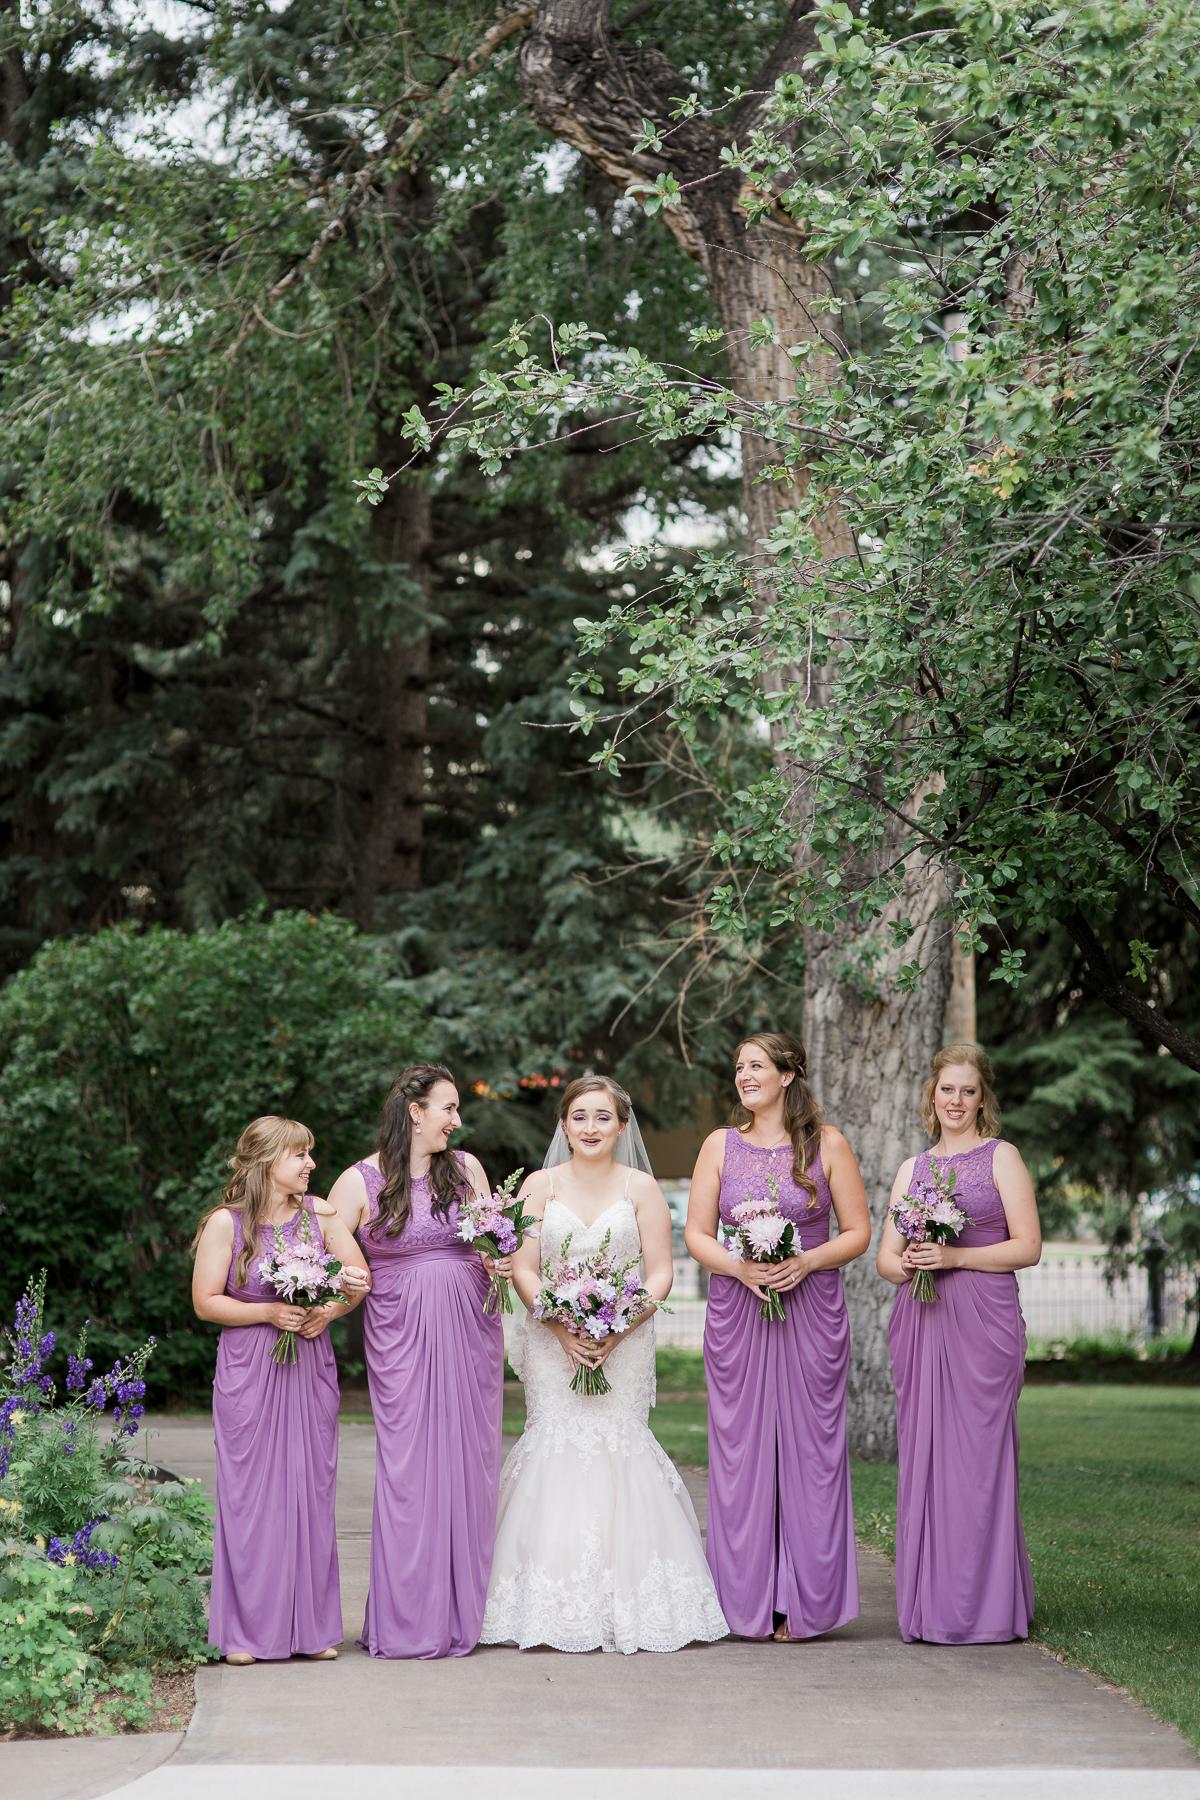 Floor length lavender bridesmaids dresses